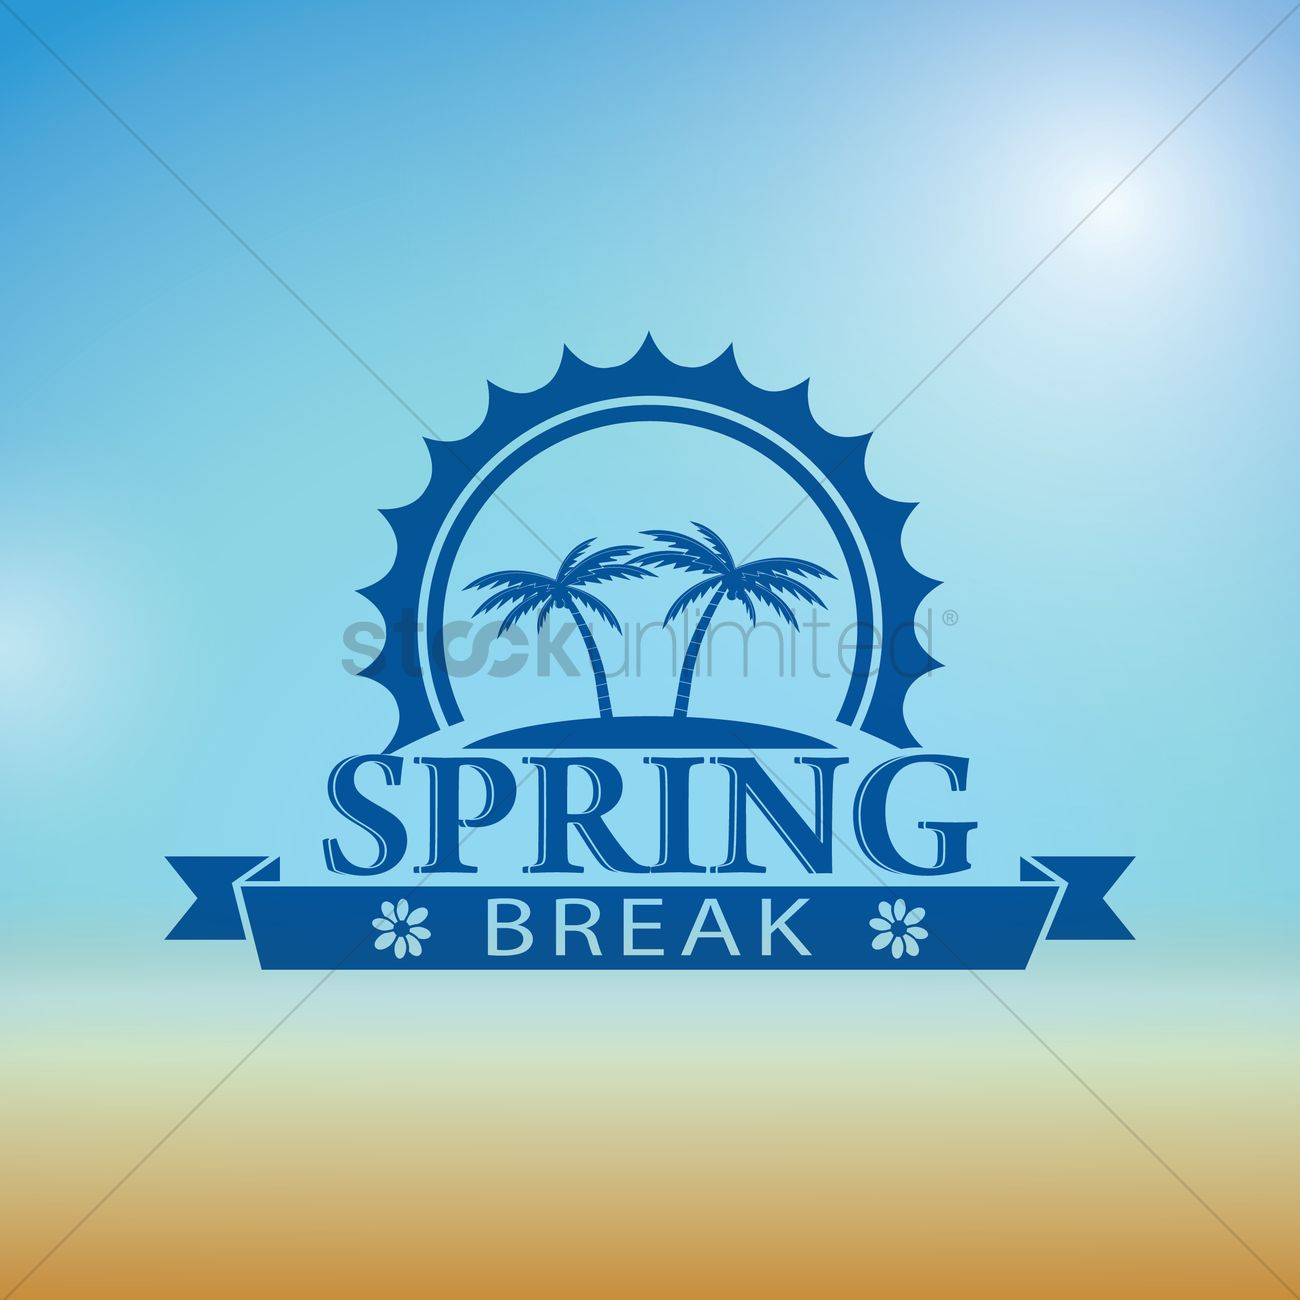 1300x1300 Spring Break Design Vector Image